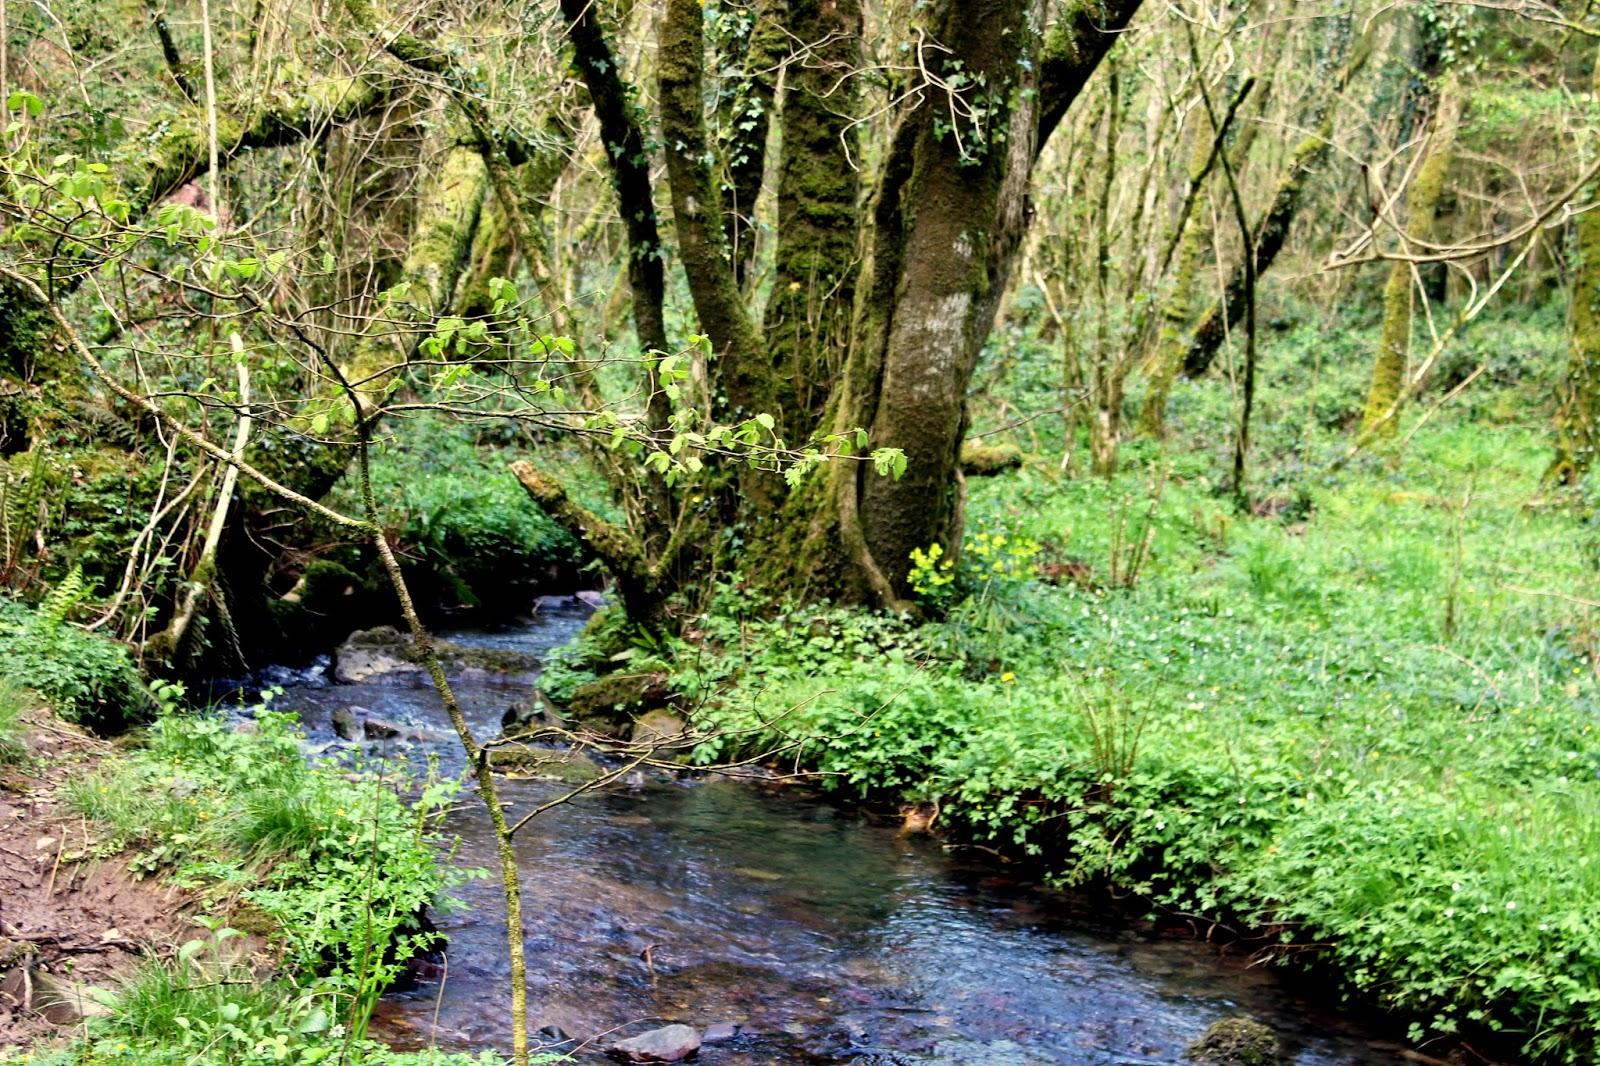 wild stream in woods